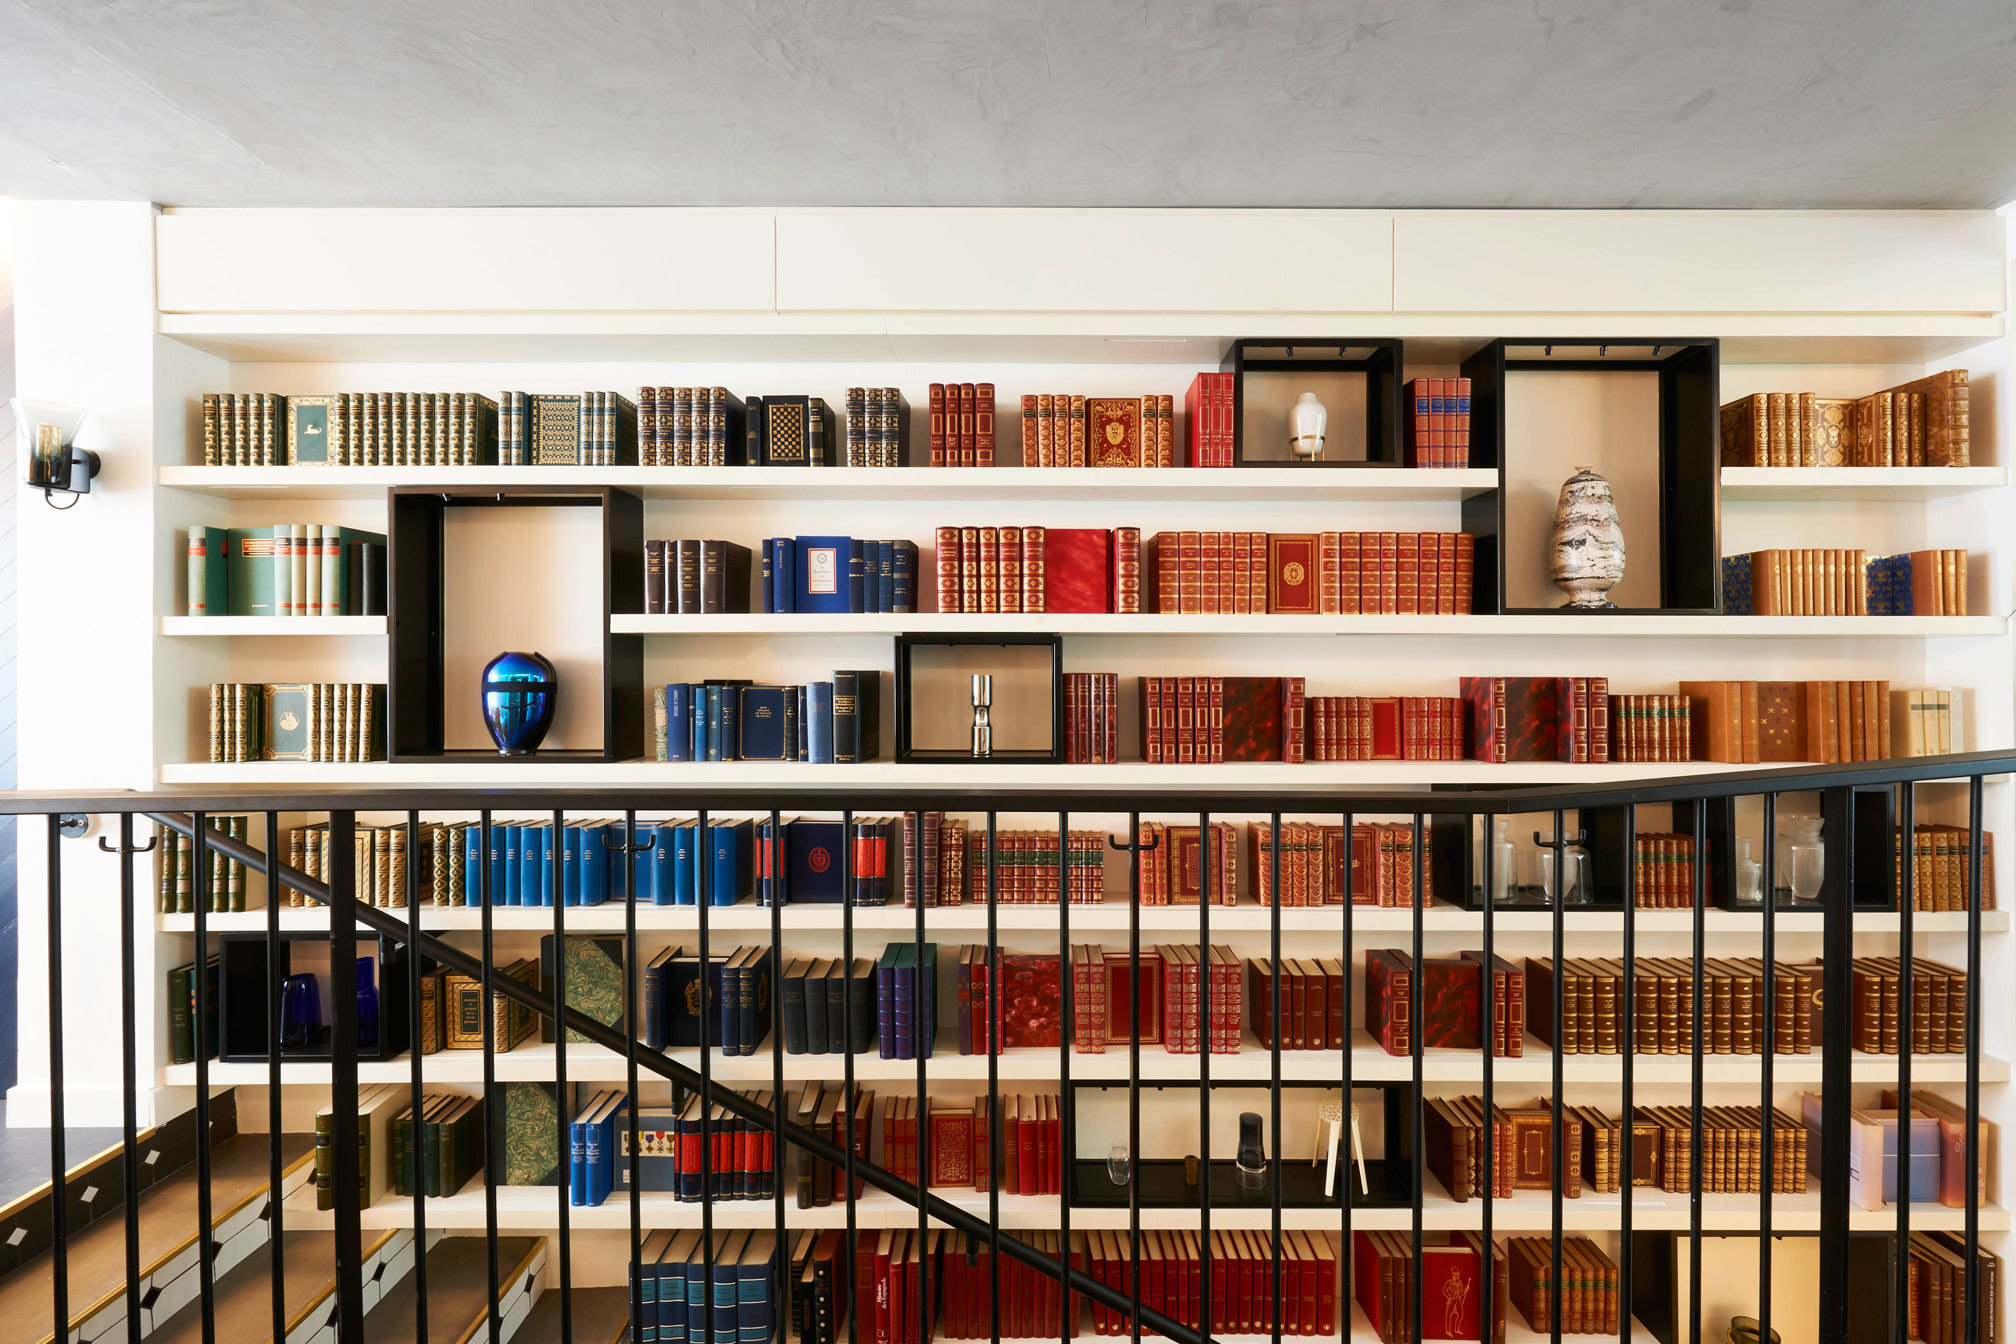 Hotels indoor library shelf ceiling public library building shelving furniture bookcase interior design bookshelf